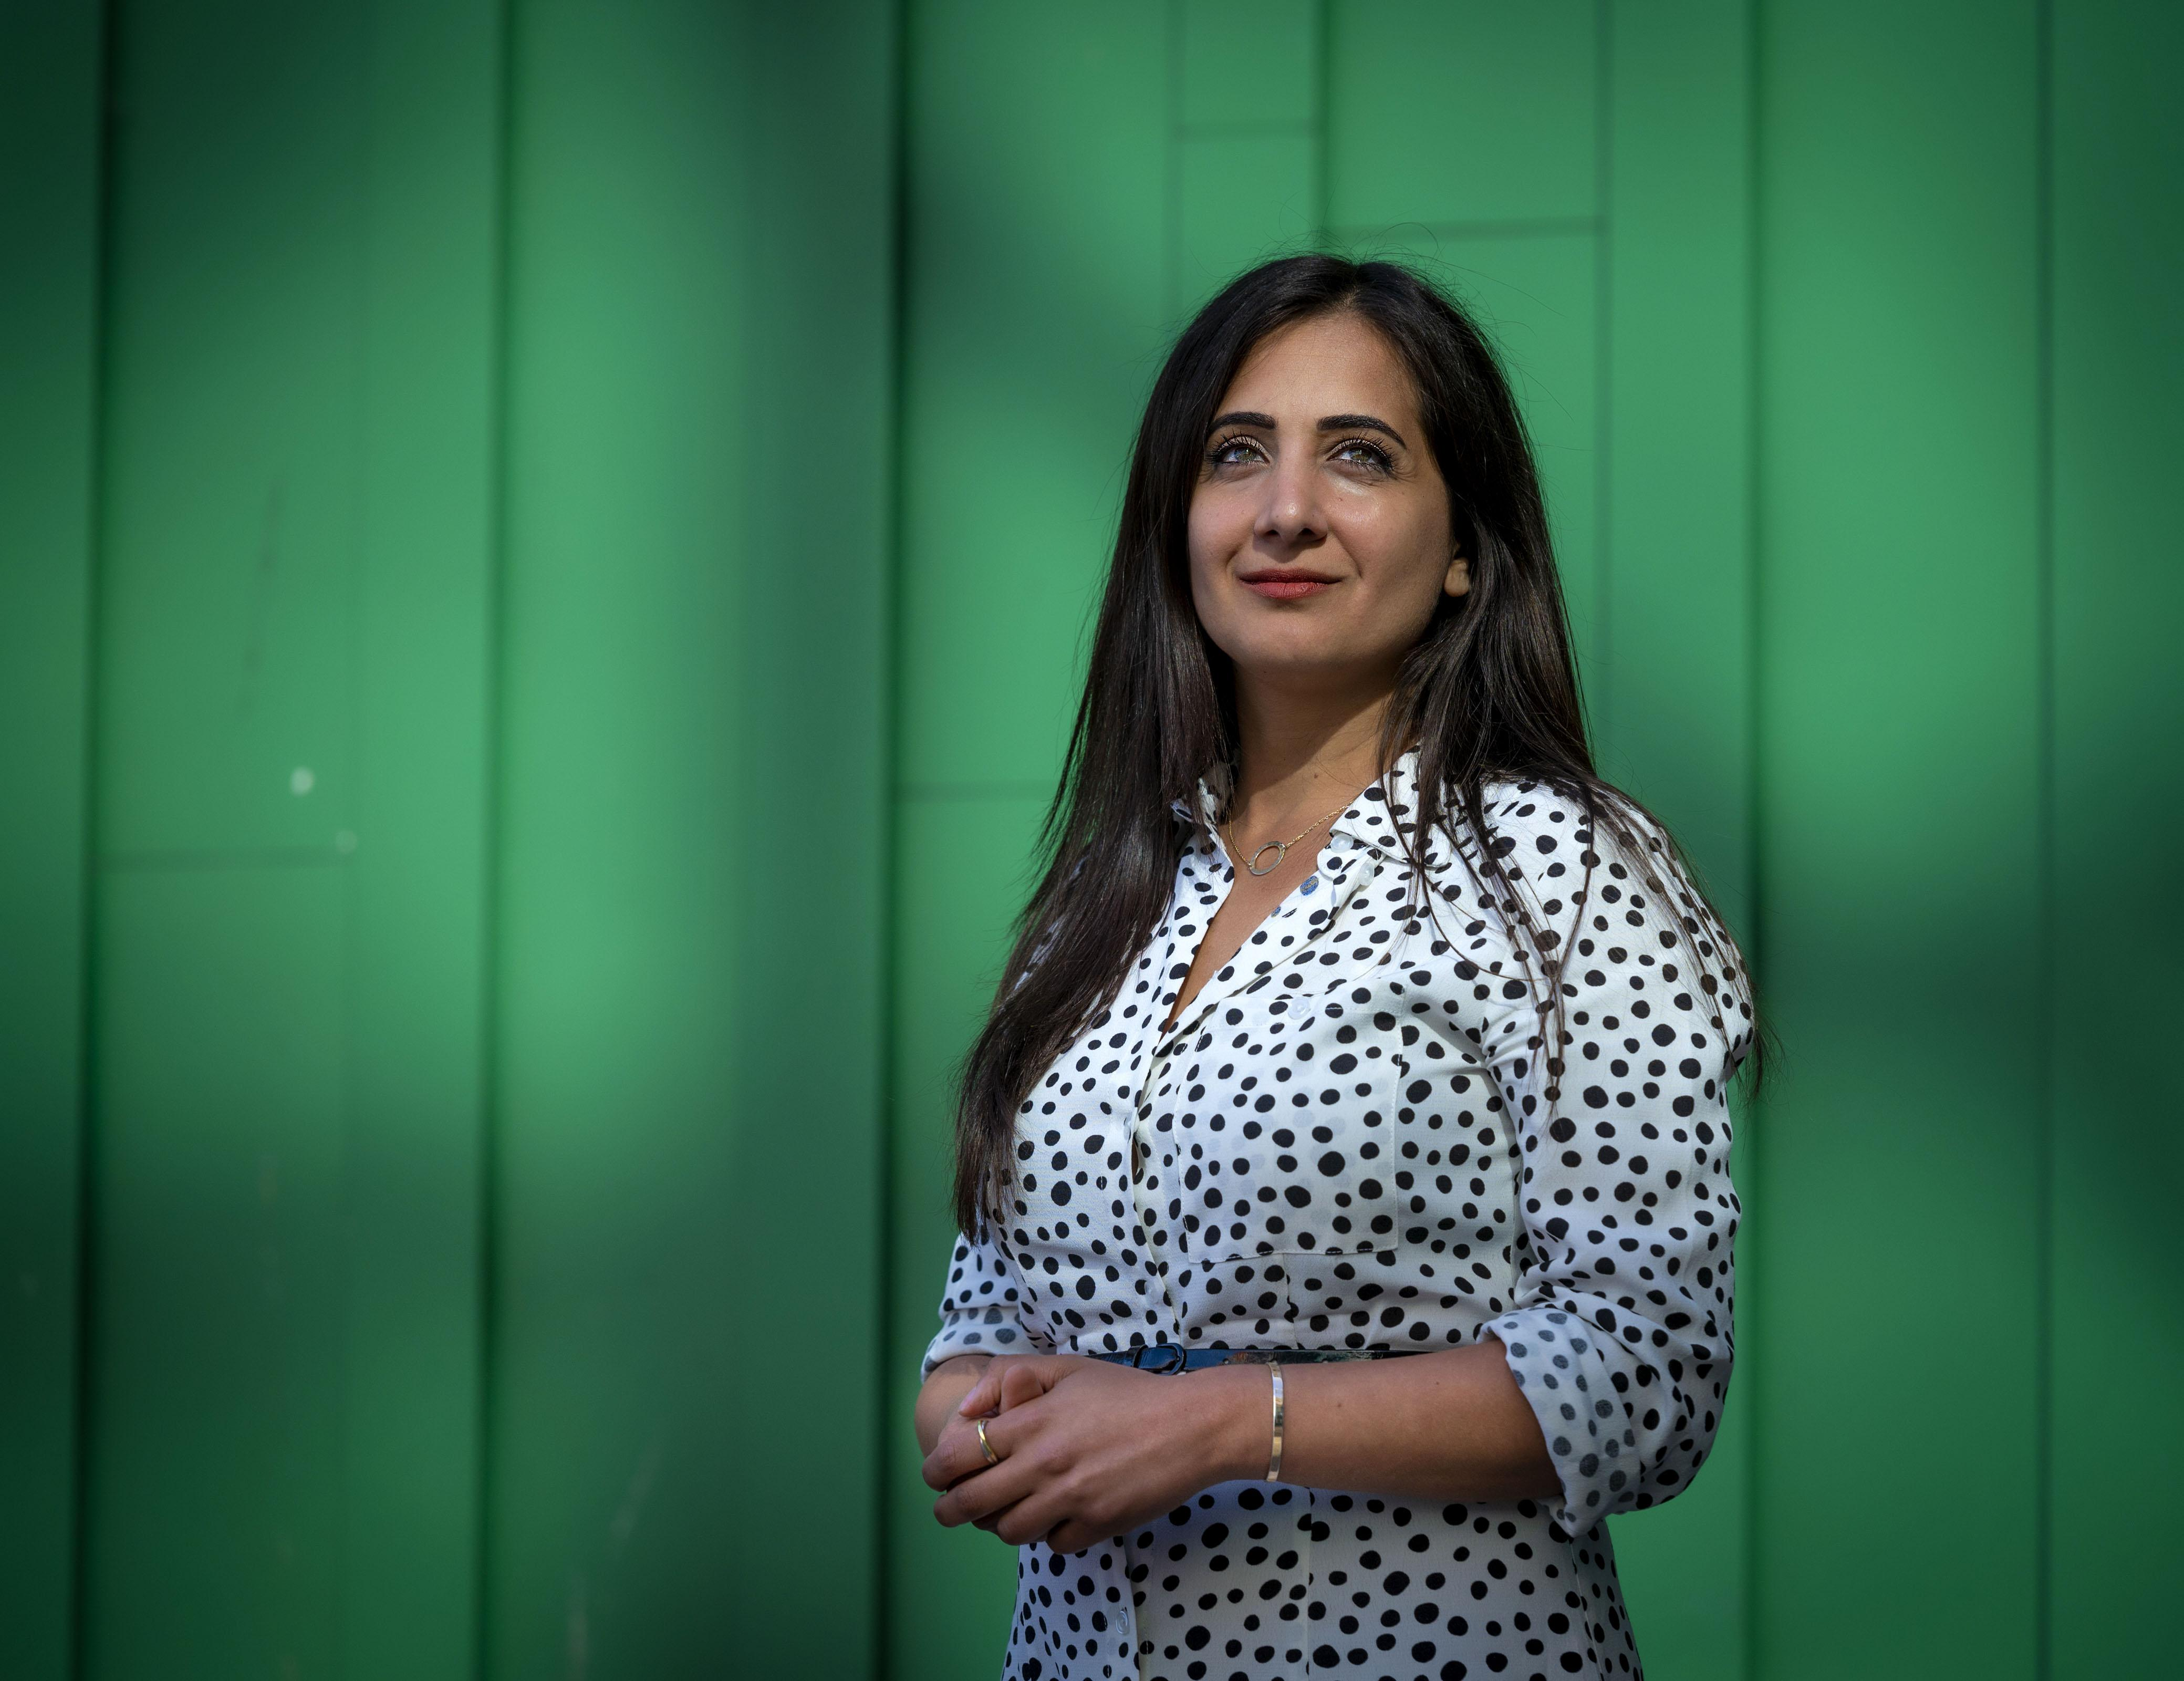 Zaanse wethouder Songül Mutluer (PvdA) doet gooi naar Tweede Kamerzetel